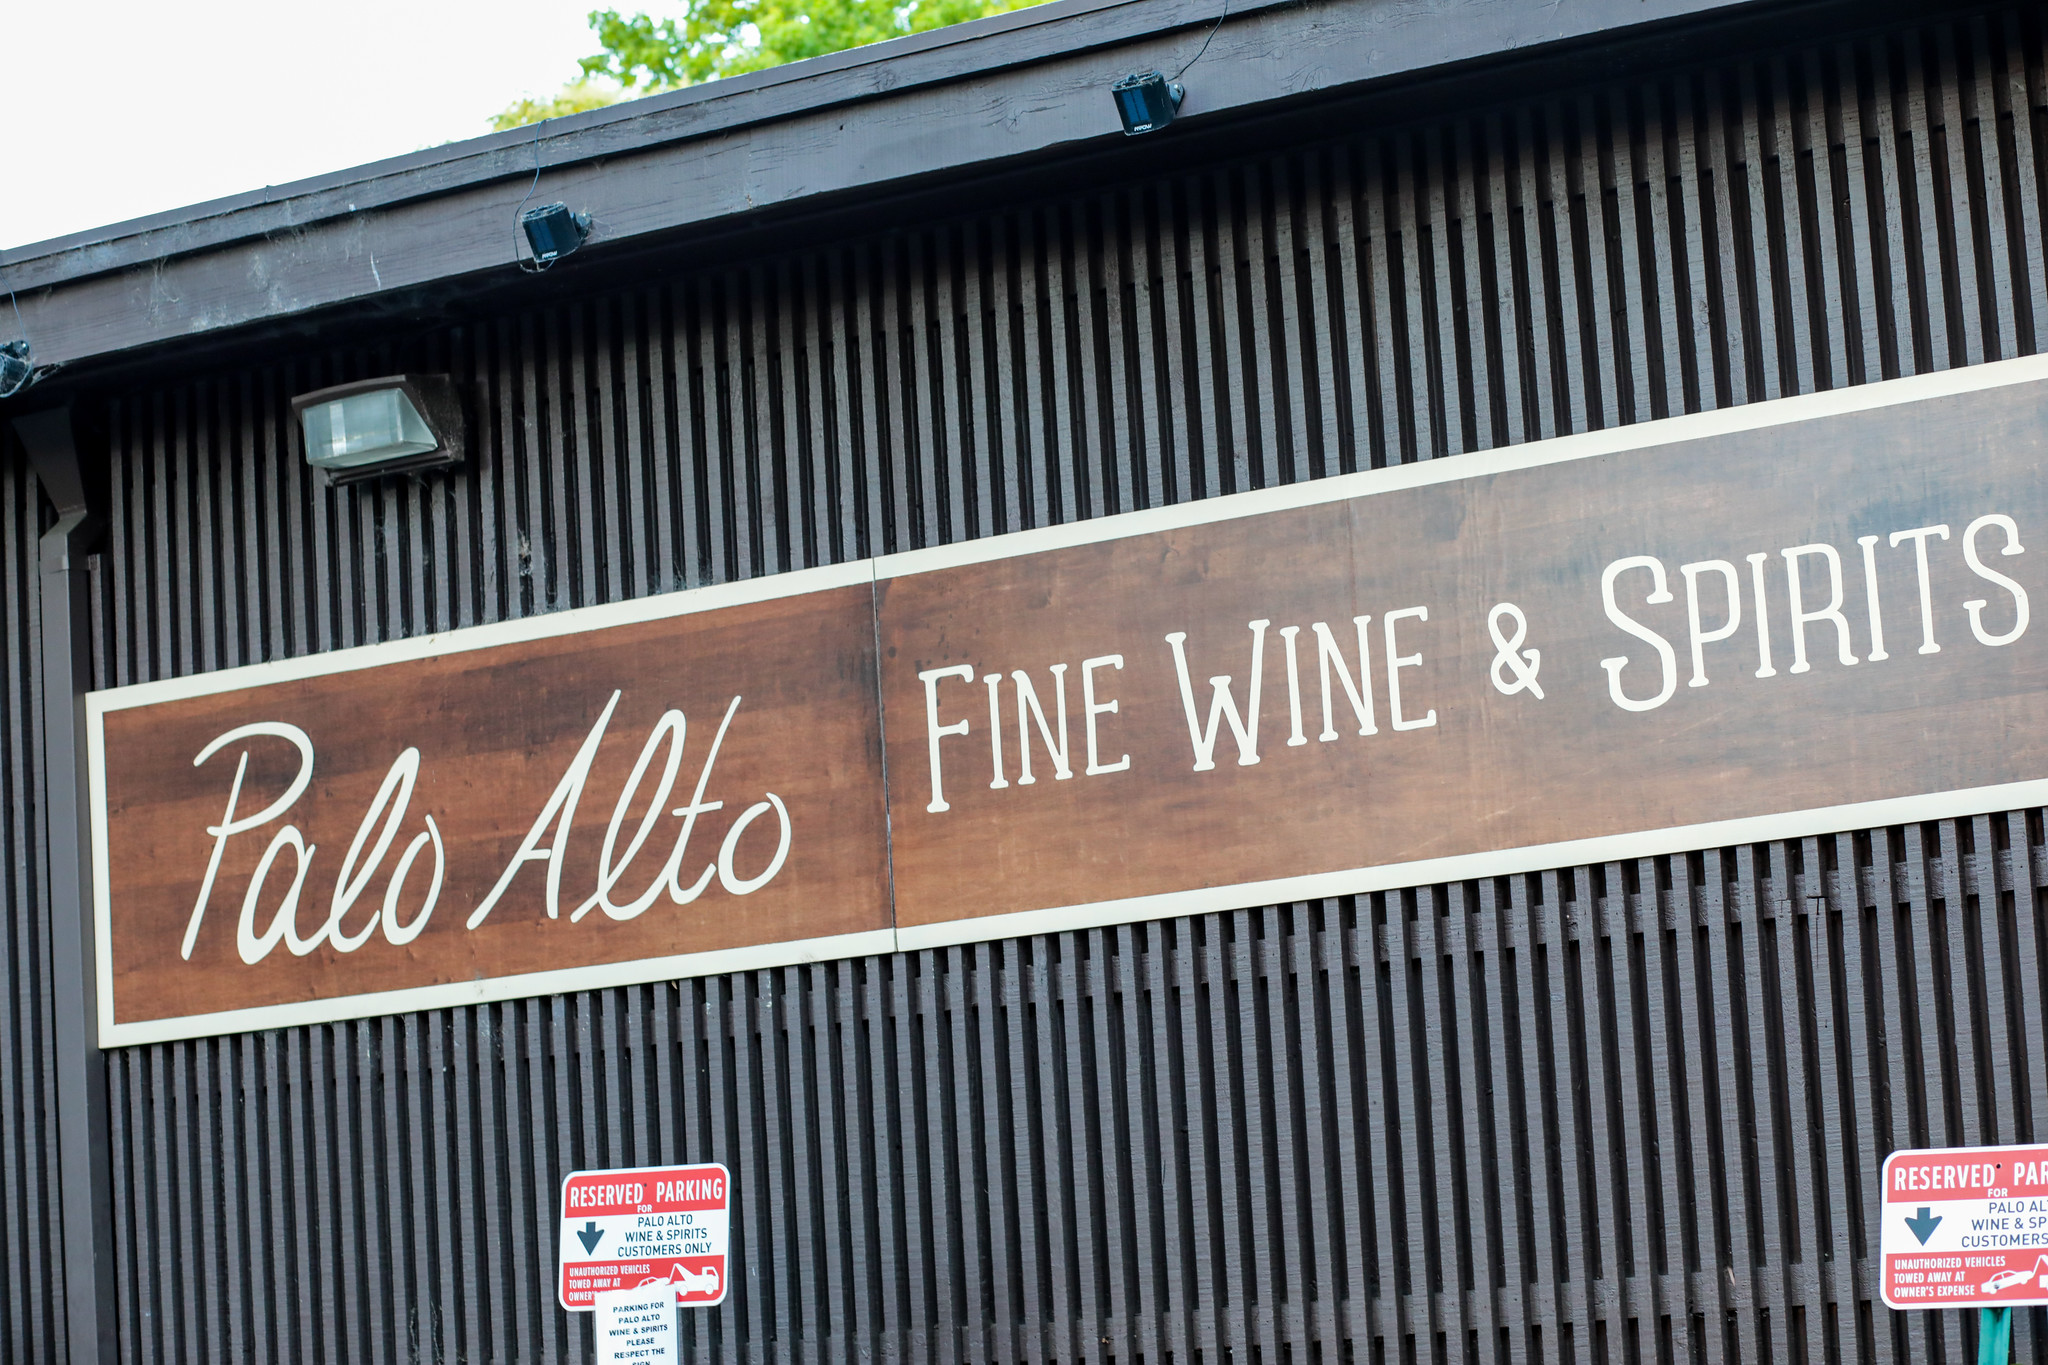 Midtown Palo Alto Blu Skye Media-1141-X4.jpg